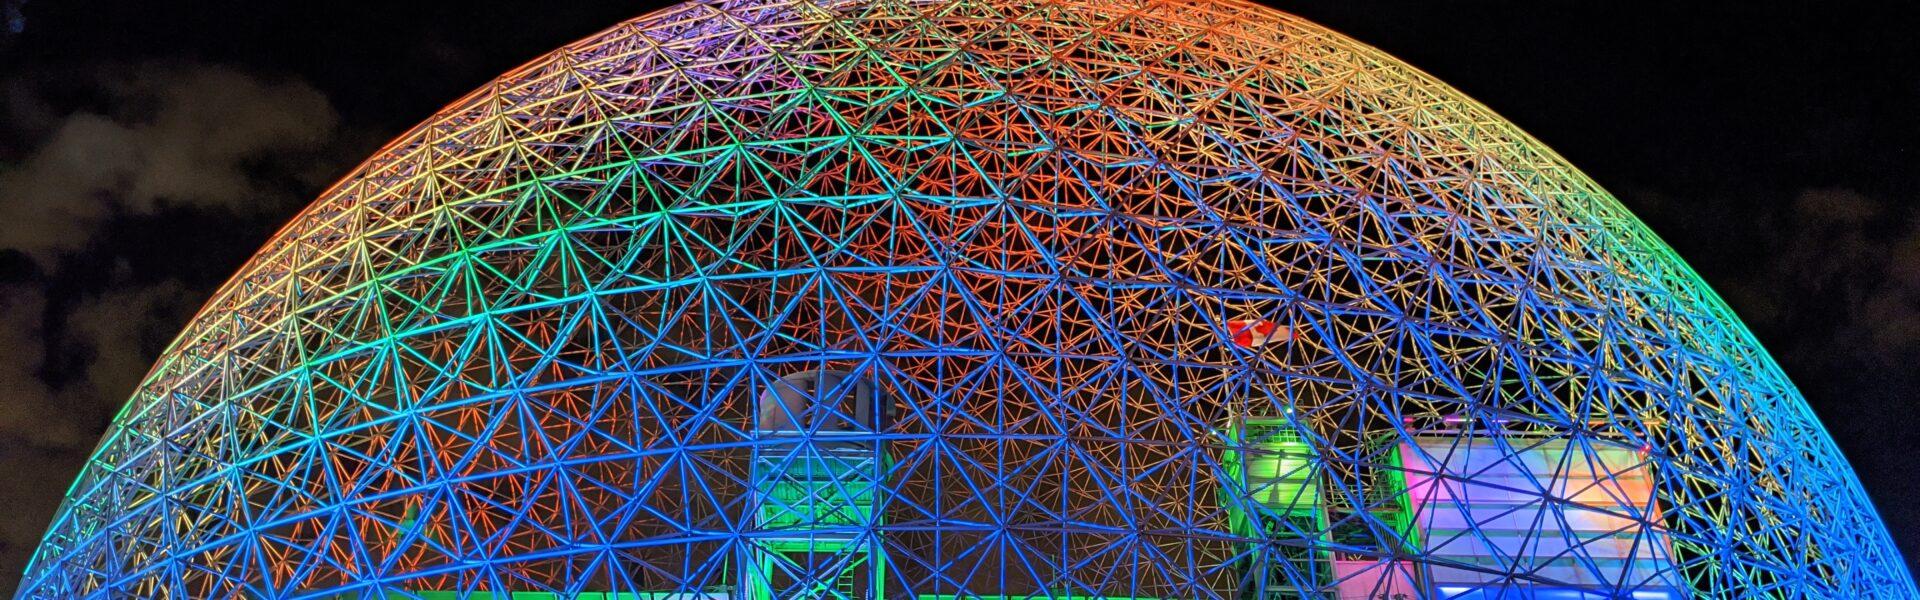 La Biosphère